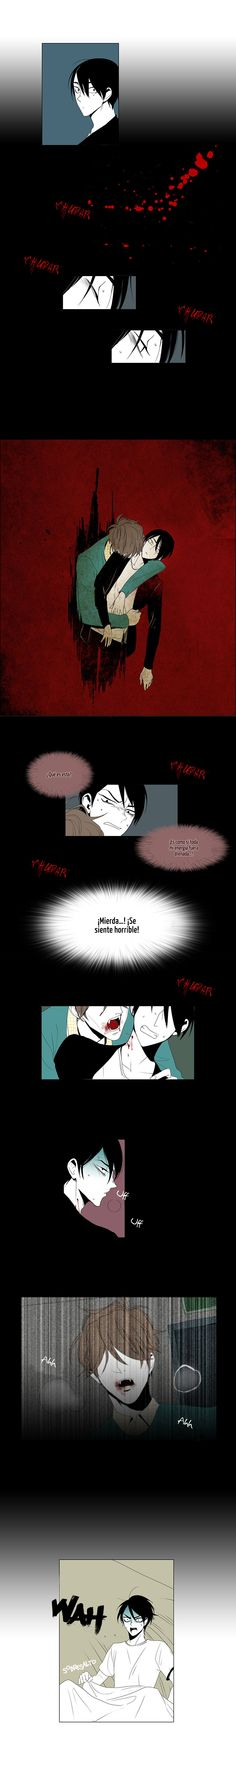 Manga Bagjwi Sayug -Raising a Bat- cápitulo 1 página 000a_200533.jpg